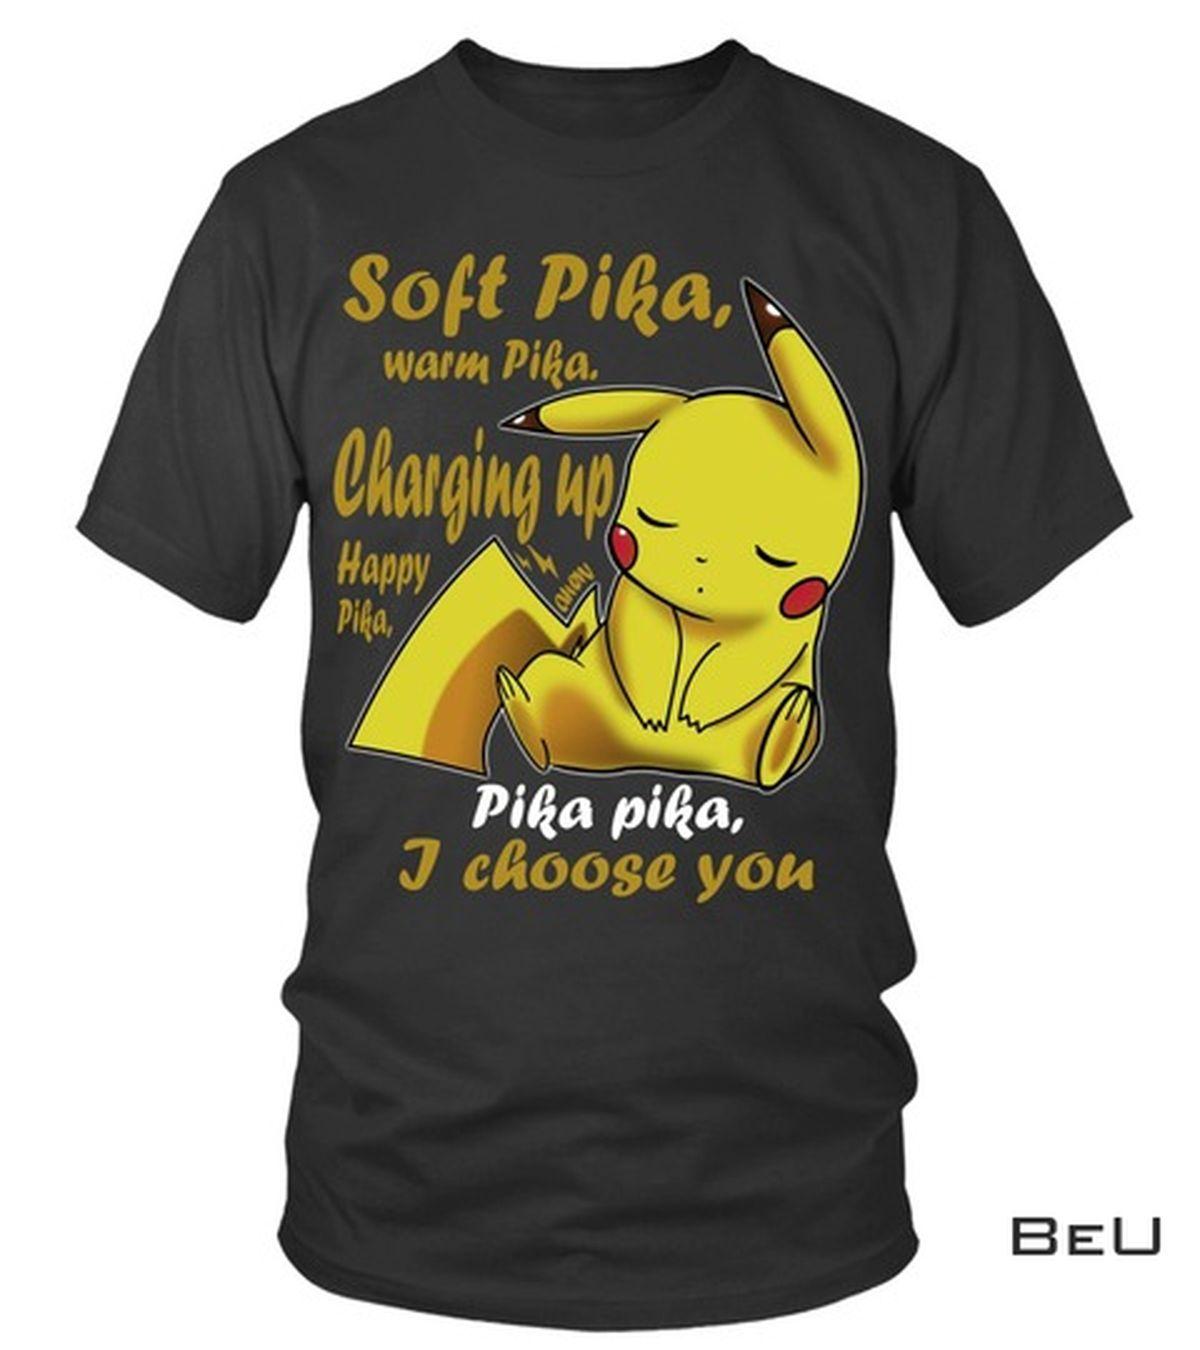 Pokemon Pikachu Soft Pika Warm Pika Shirt